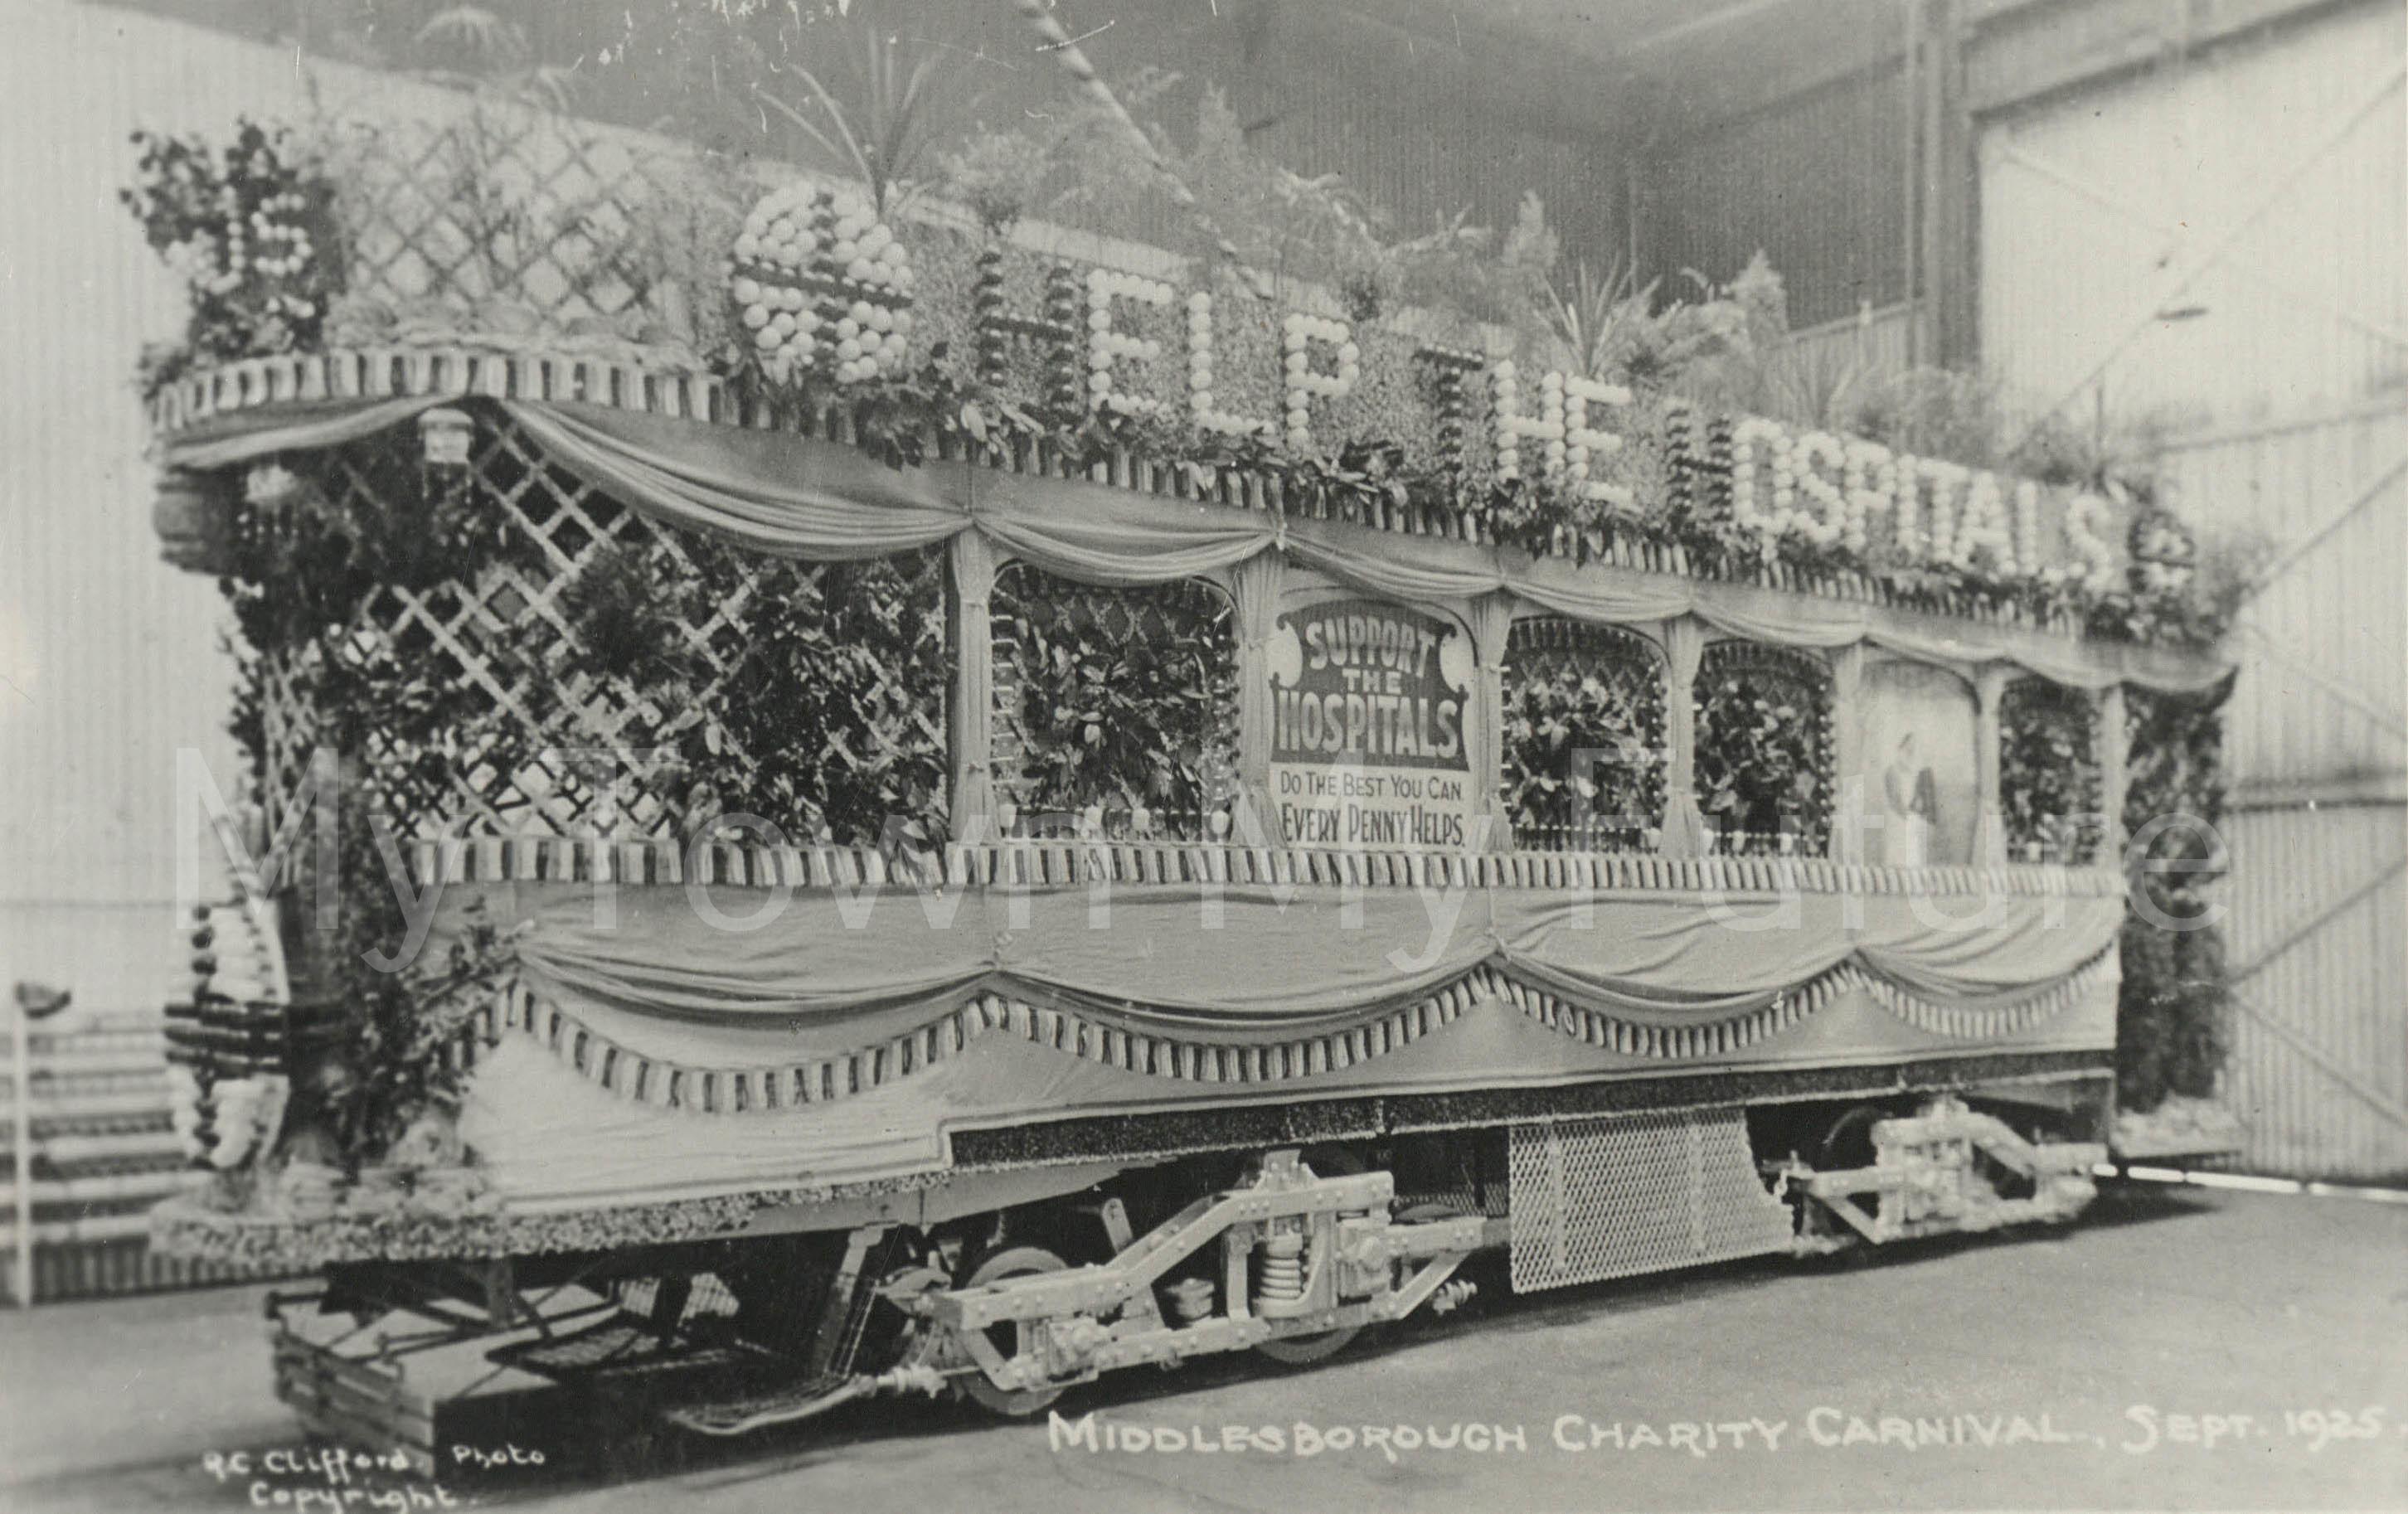 Trams, 1925, R.C.Clifford